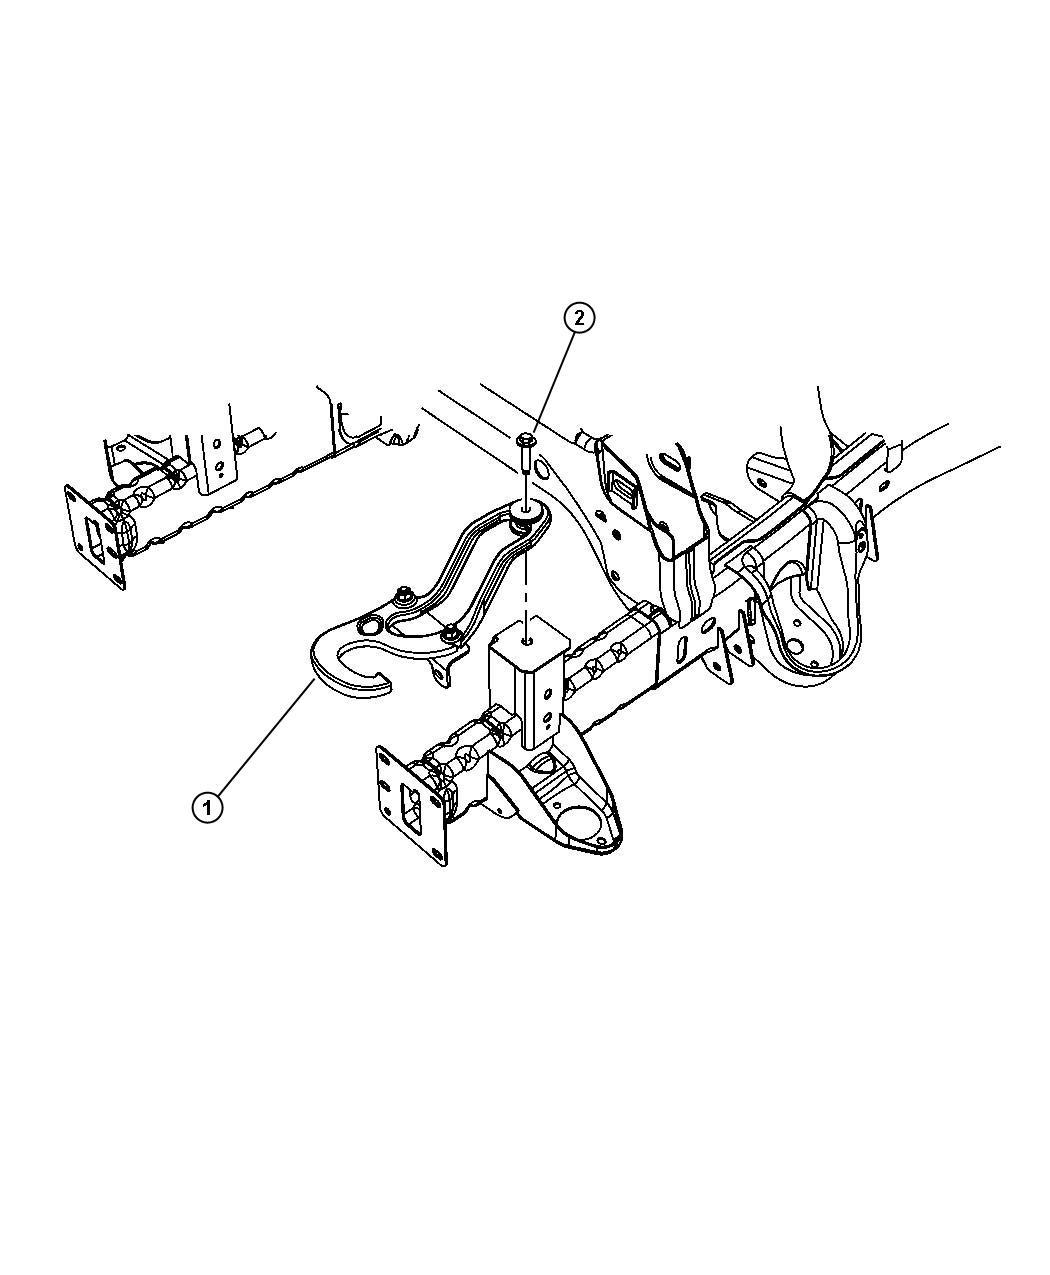 2012 Dodge Ram 1500 Hook. Tow. Left. [tow hooks], [add tow